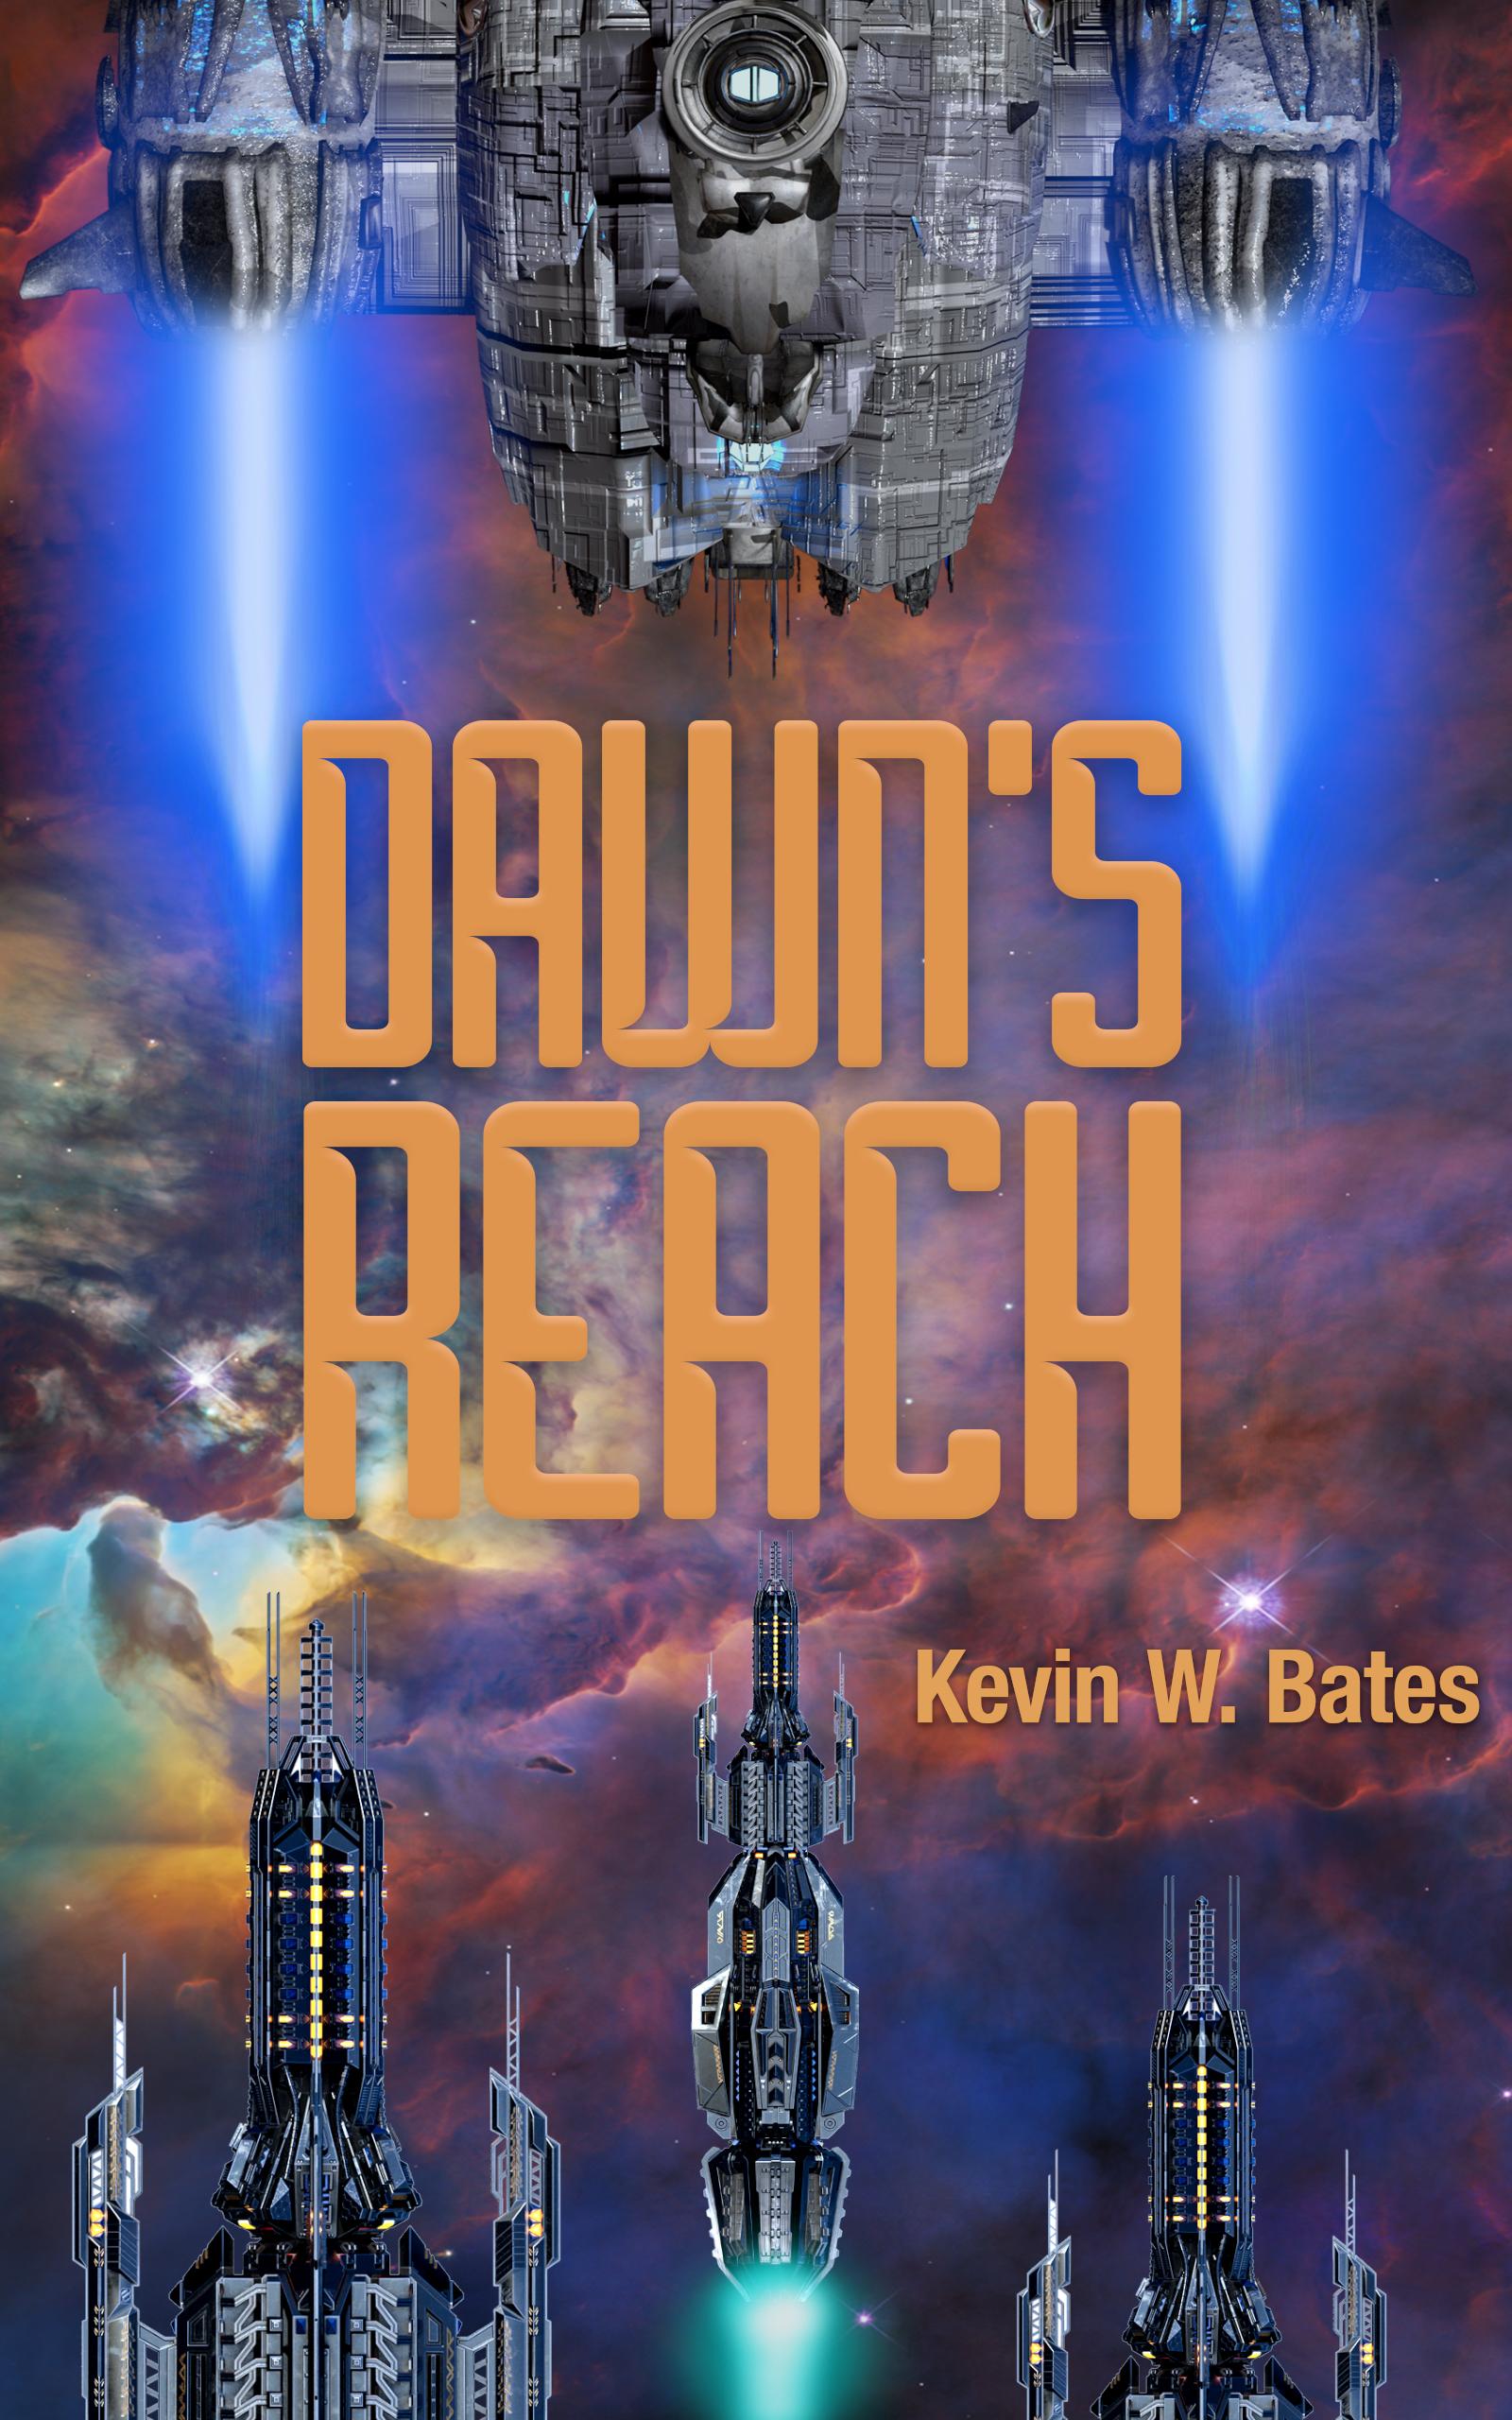 dawnsreach_kevinbates